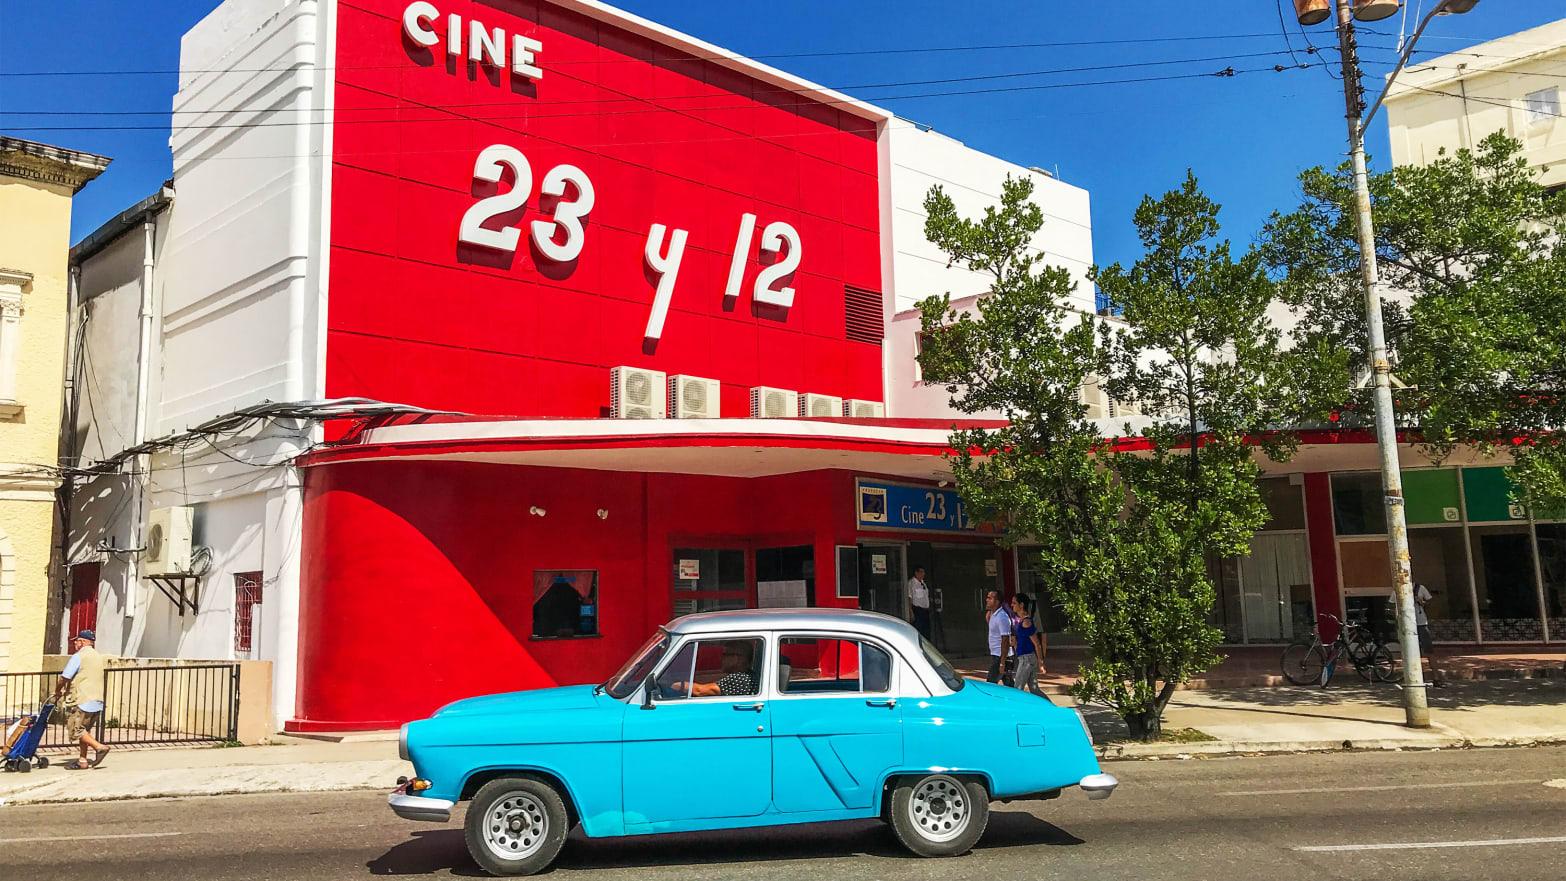 Cuba's Old Movie Theaters Make Delightful Destinations